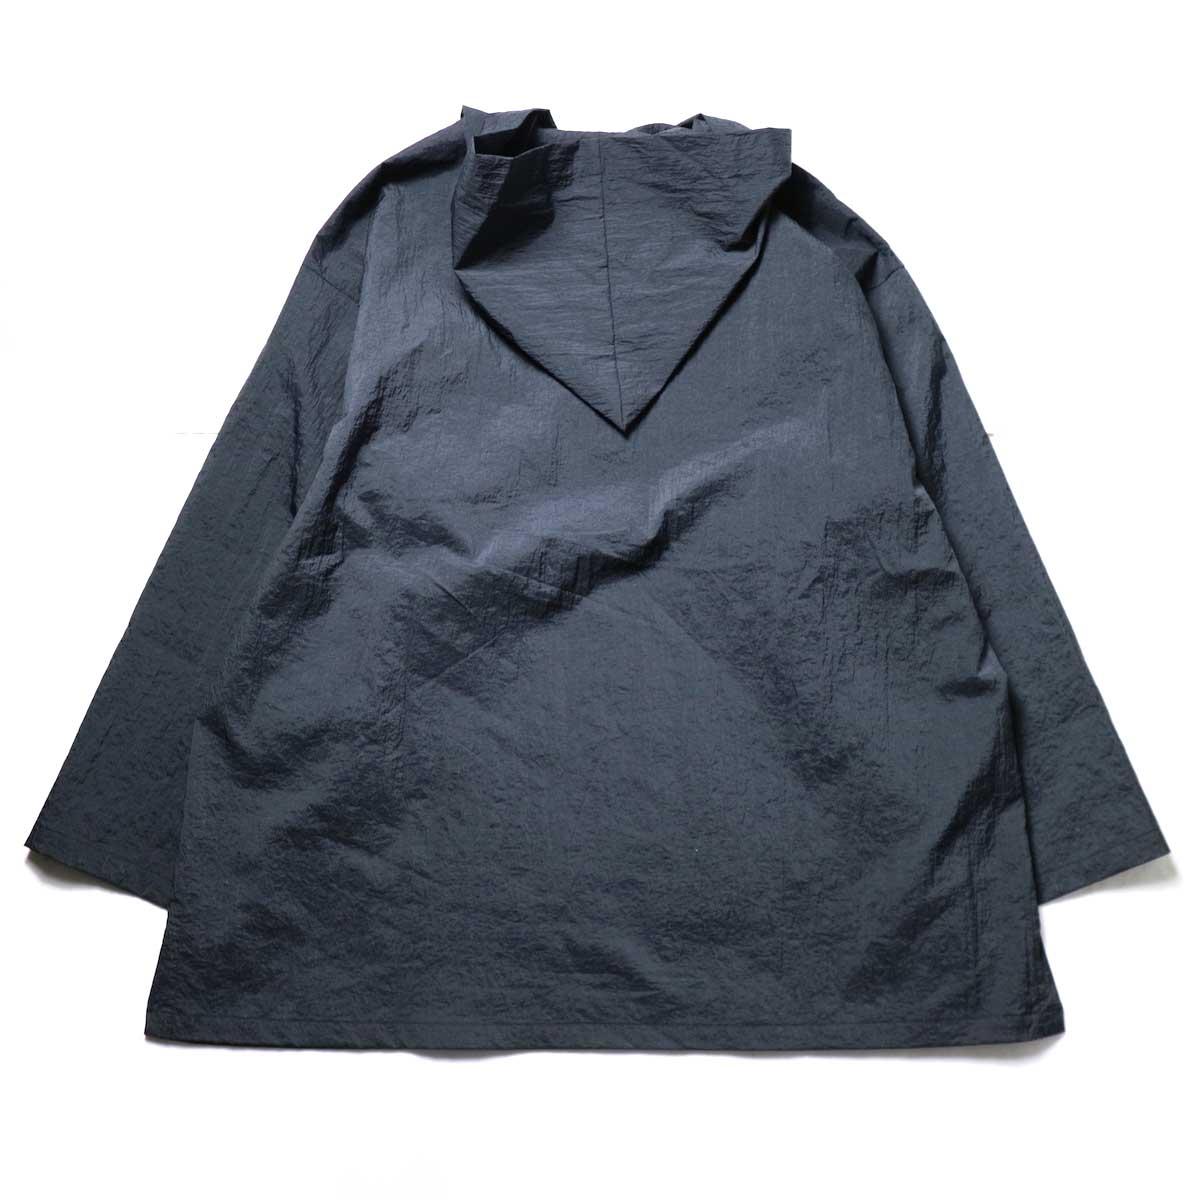 MexiPa / Nylon Mexican Parka (Black) 背面